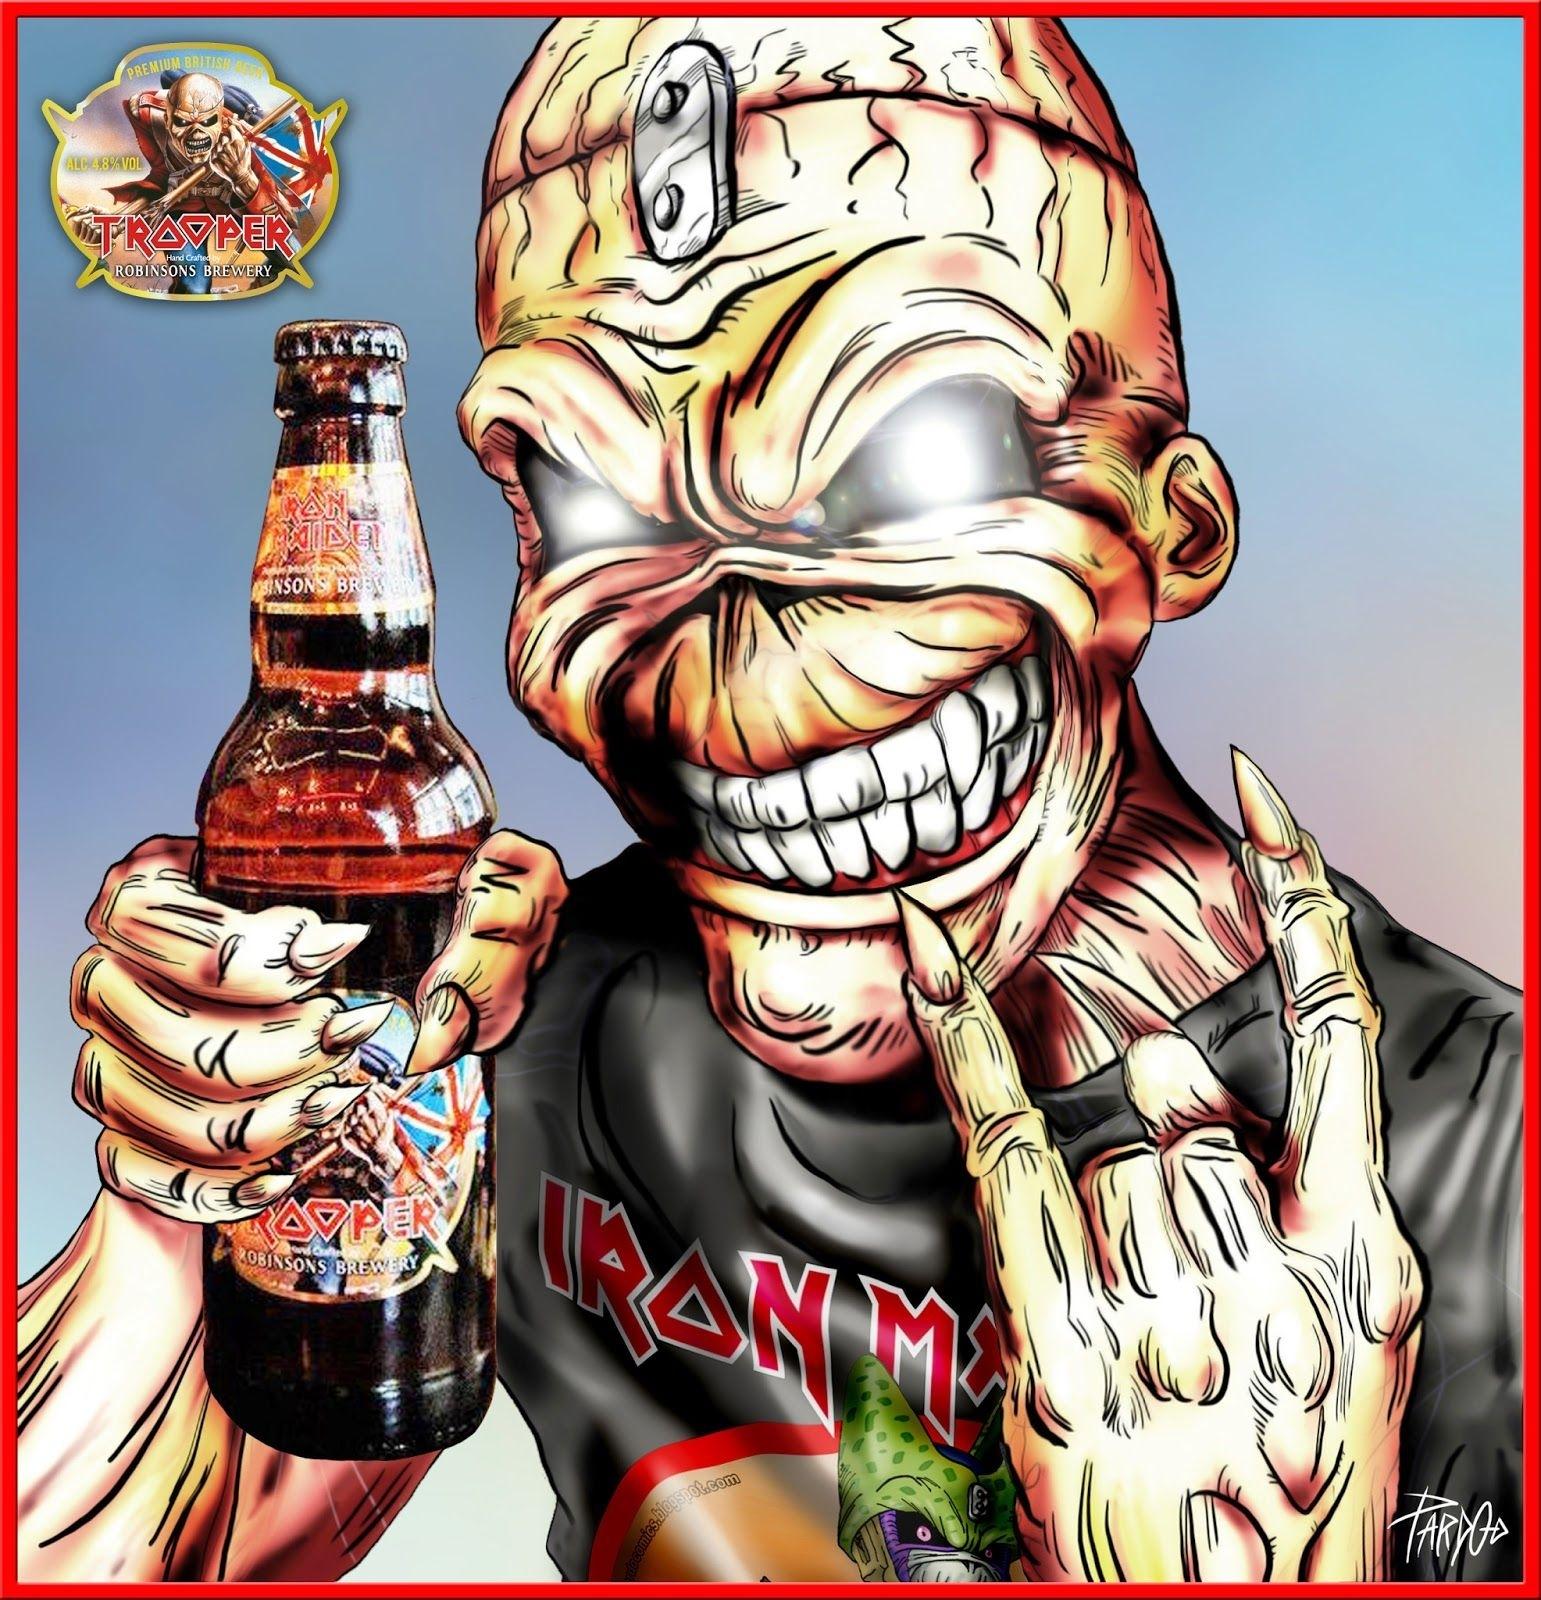 10 Best Eddie Iron Maiden Pics FULL HD 1080p For PC